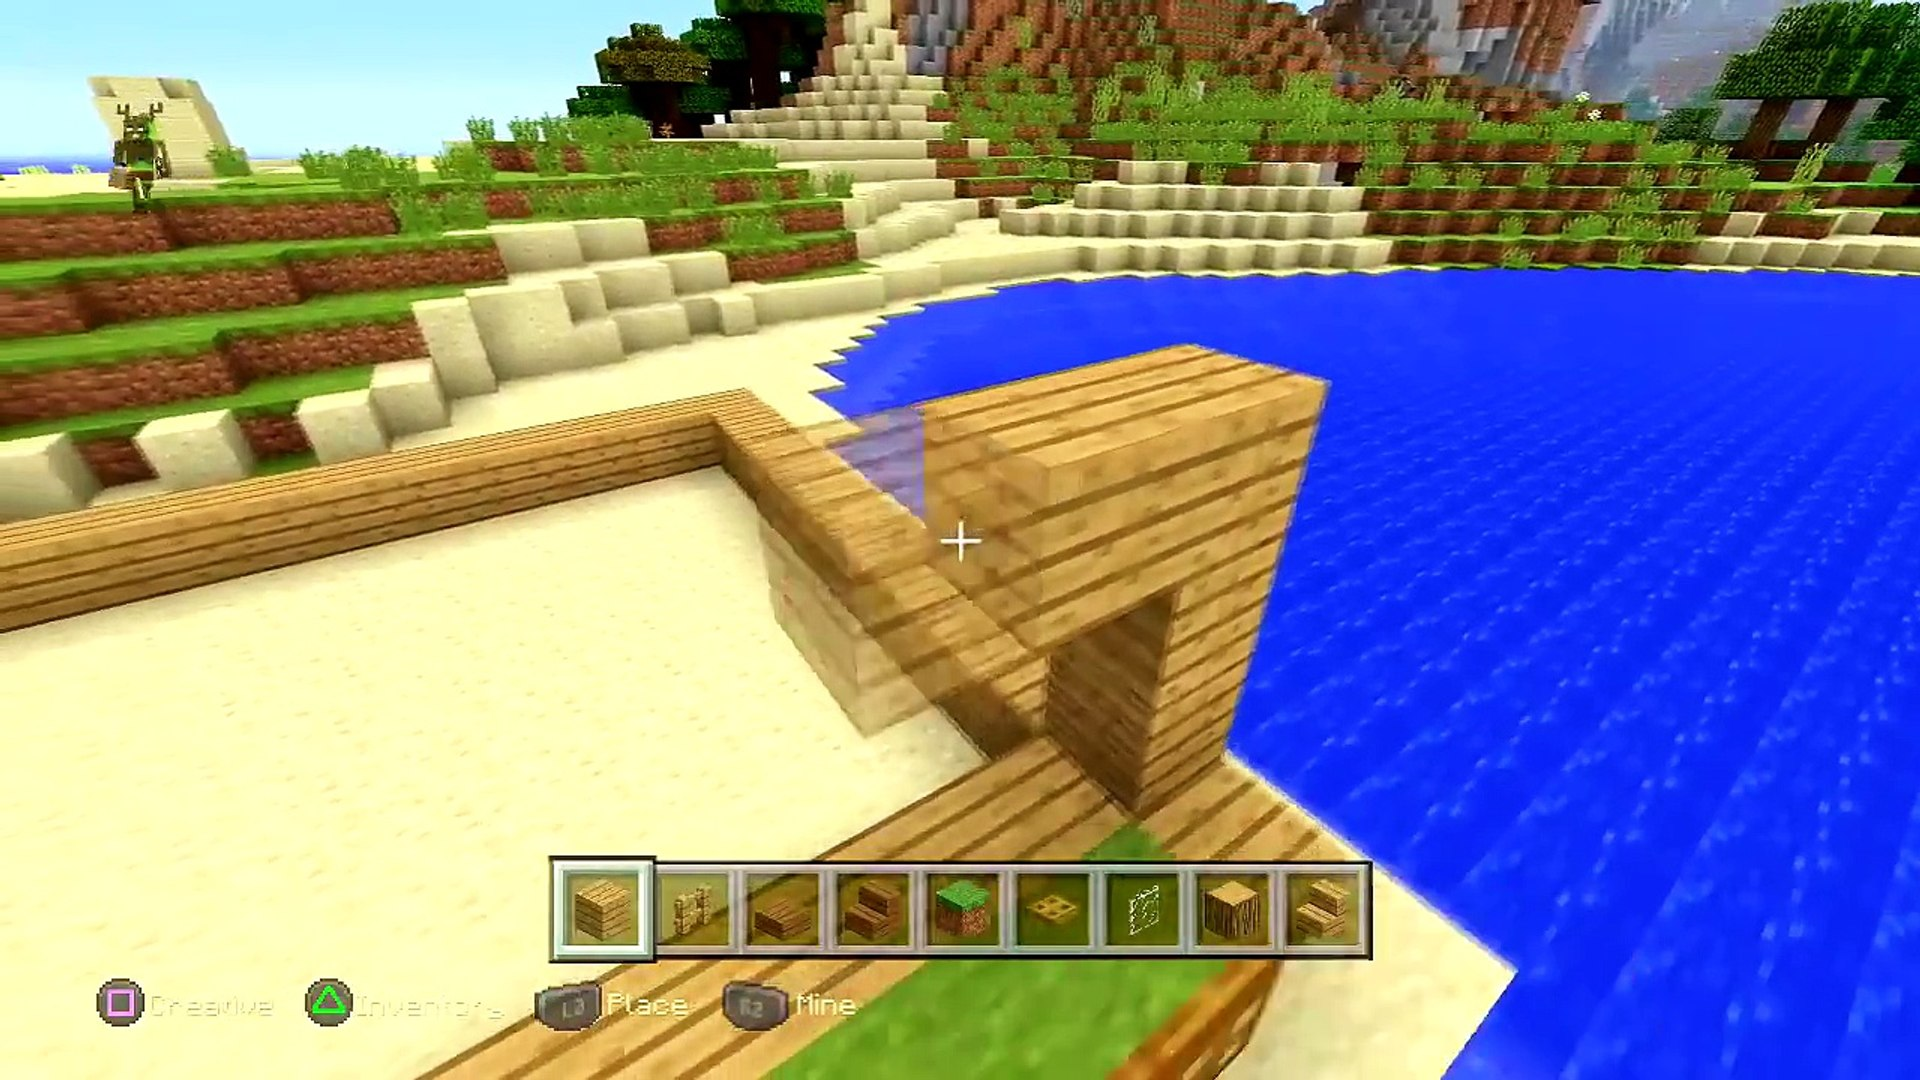 Minecraft How To Build A Beach House Tutorial Simple Easy Small Minecraft House Tutorial Video Dailymotion